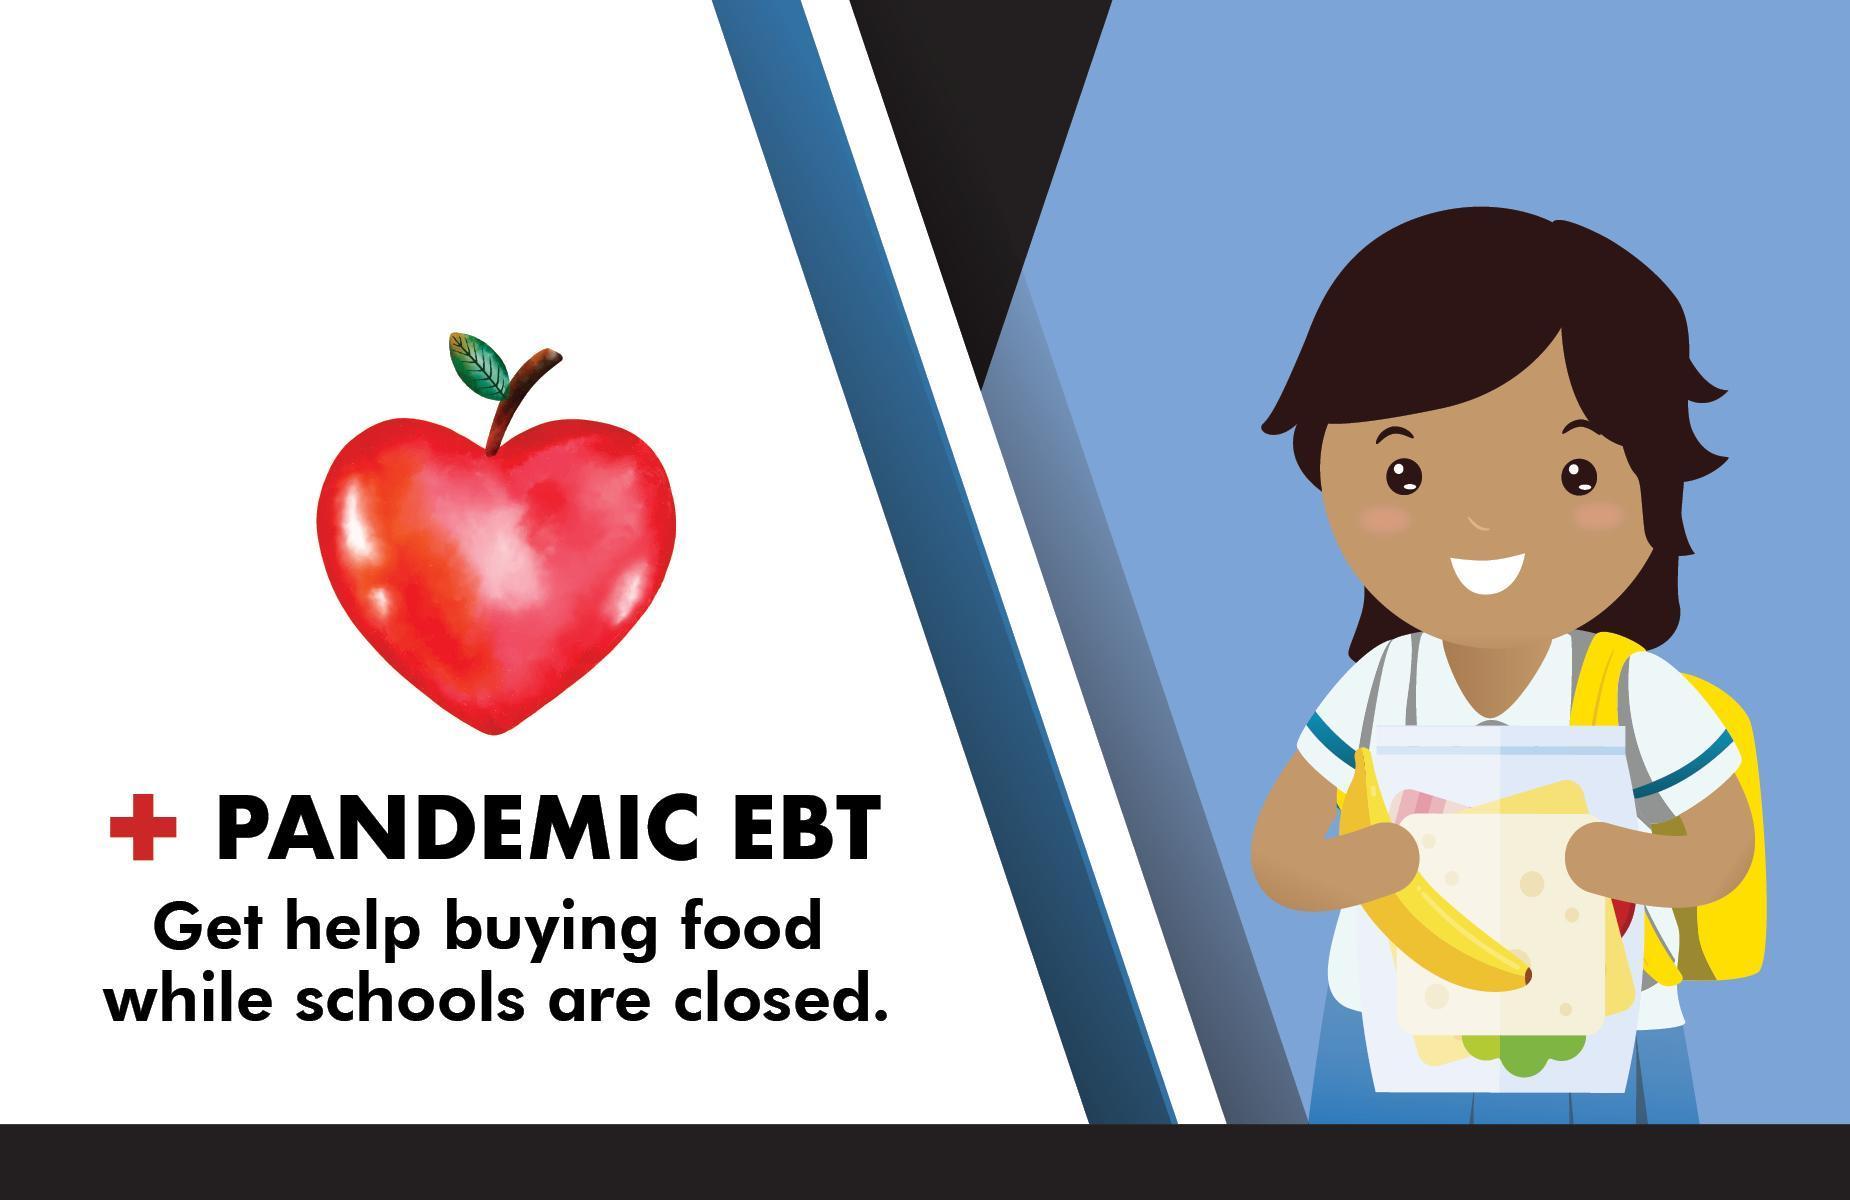 EBT Pandemic Information